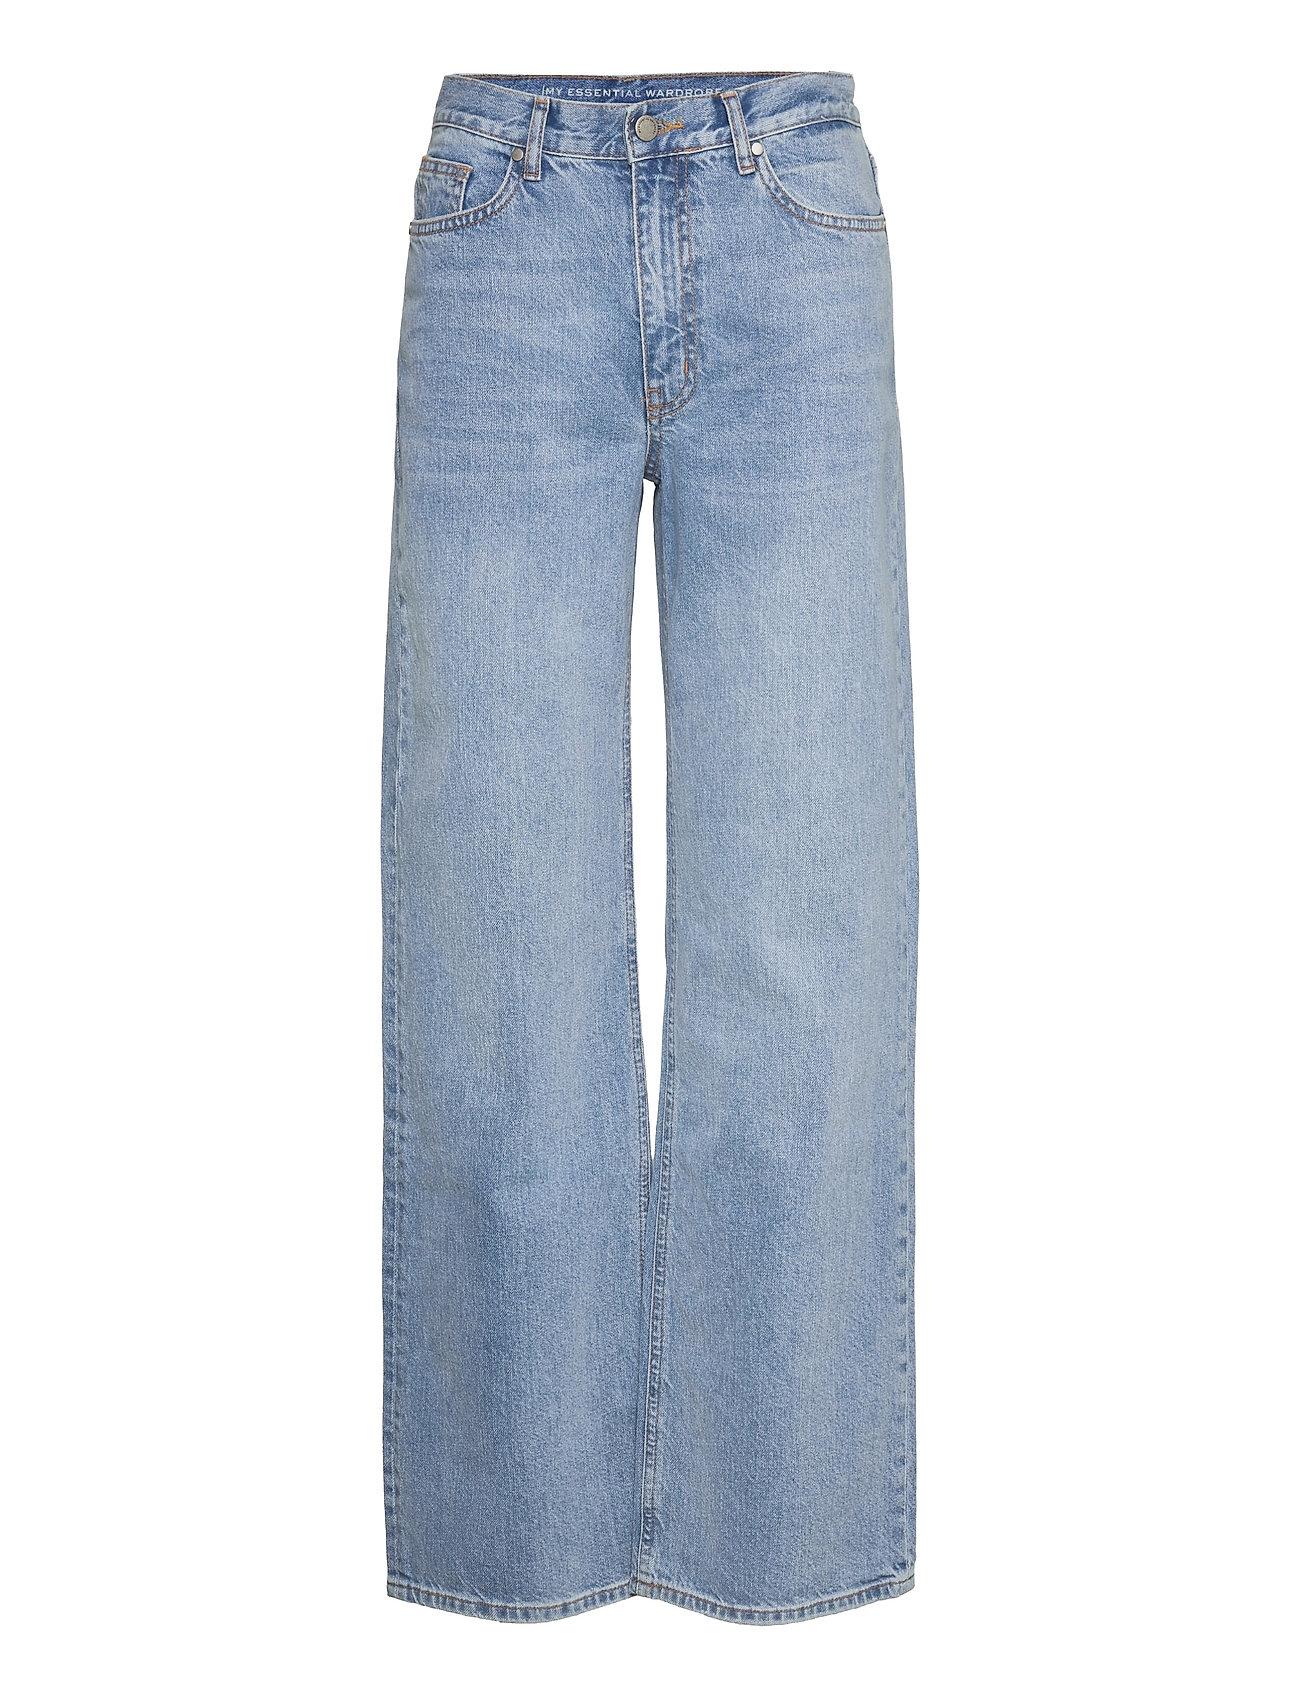 Mwlouis 123 Xhigh Wide Y Vide Jeans Blå My Essential Wardrobe